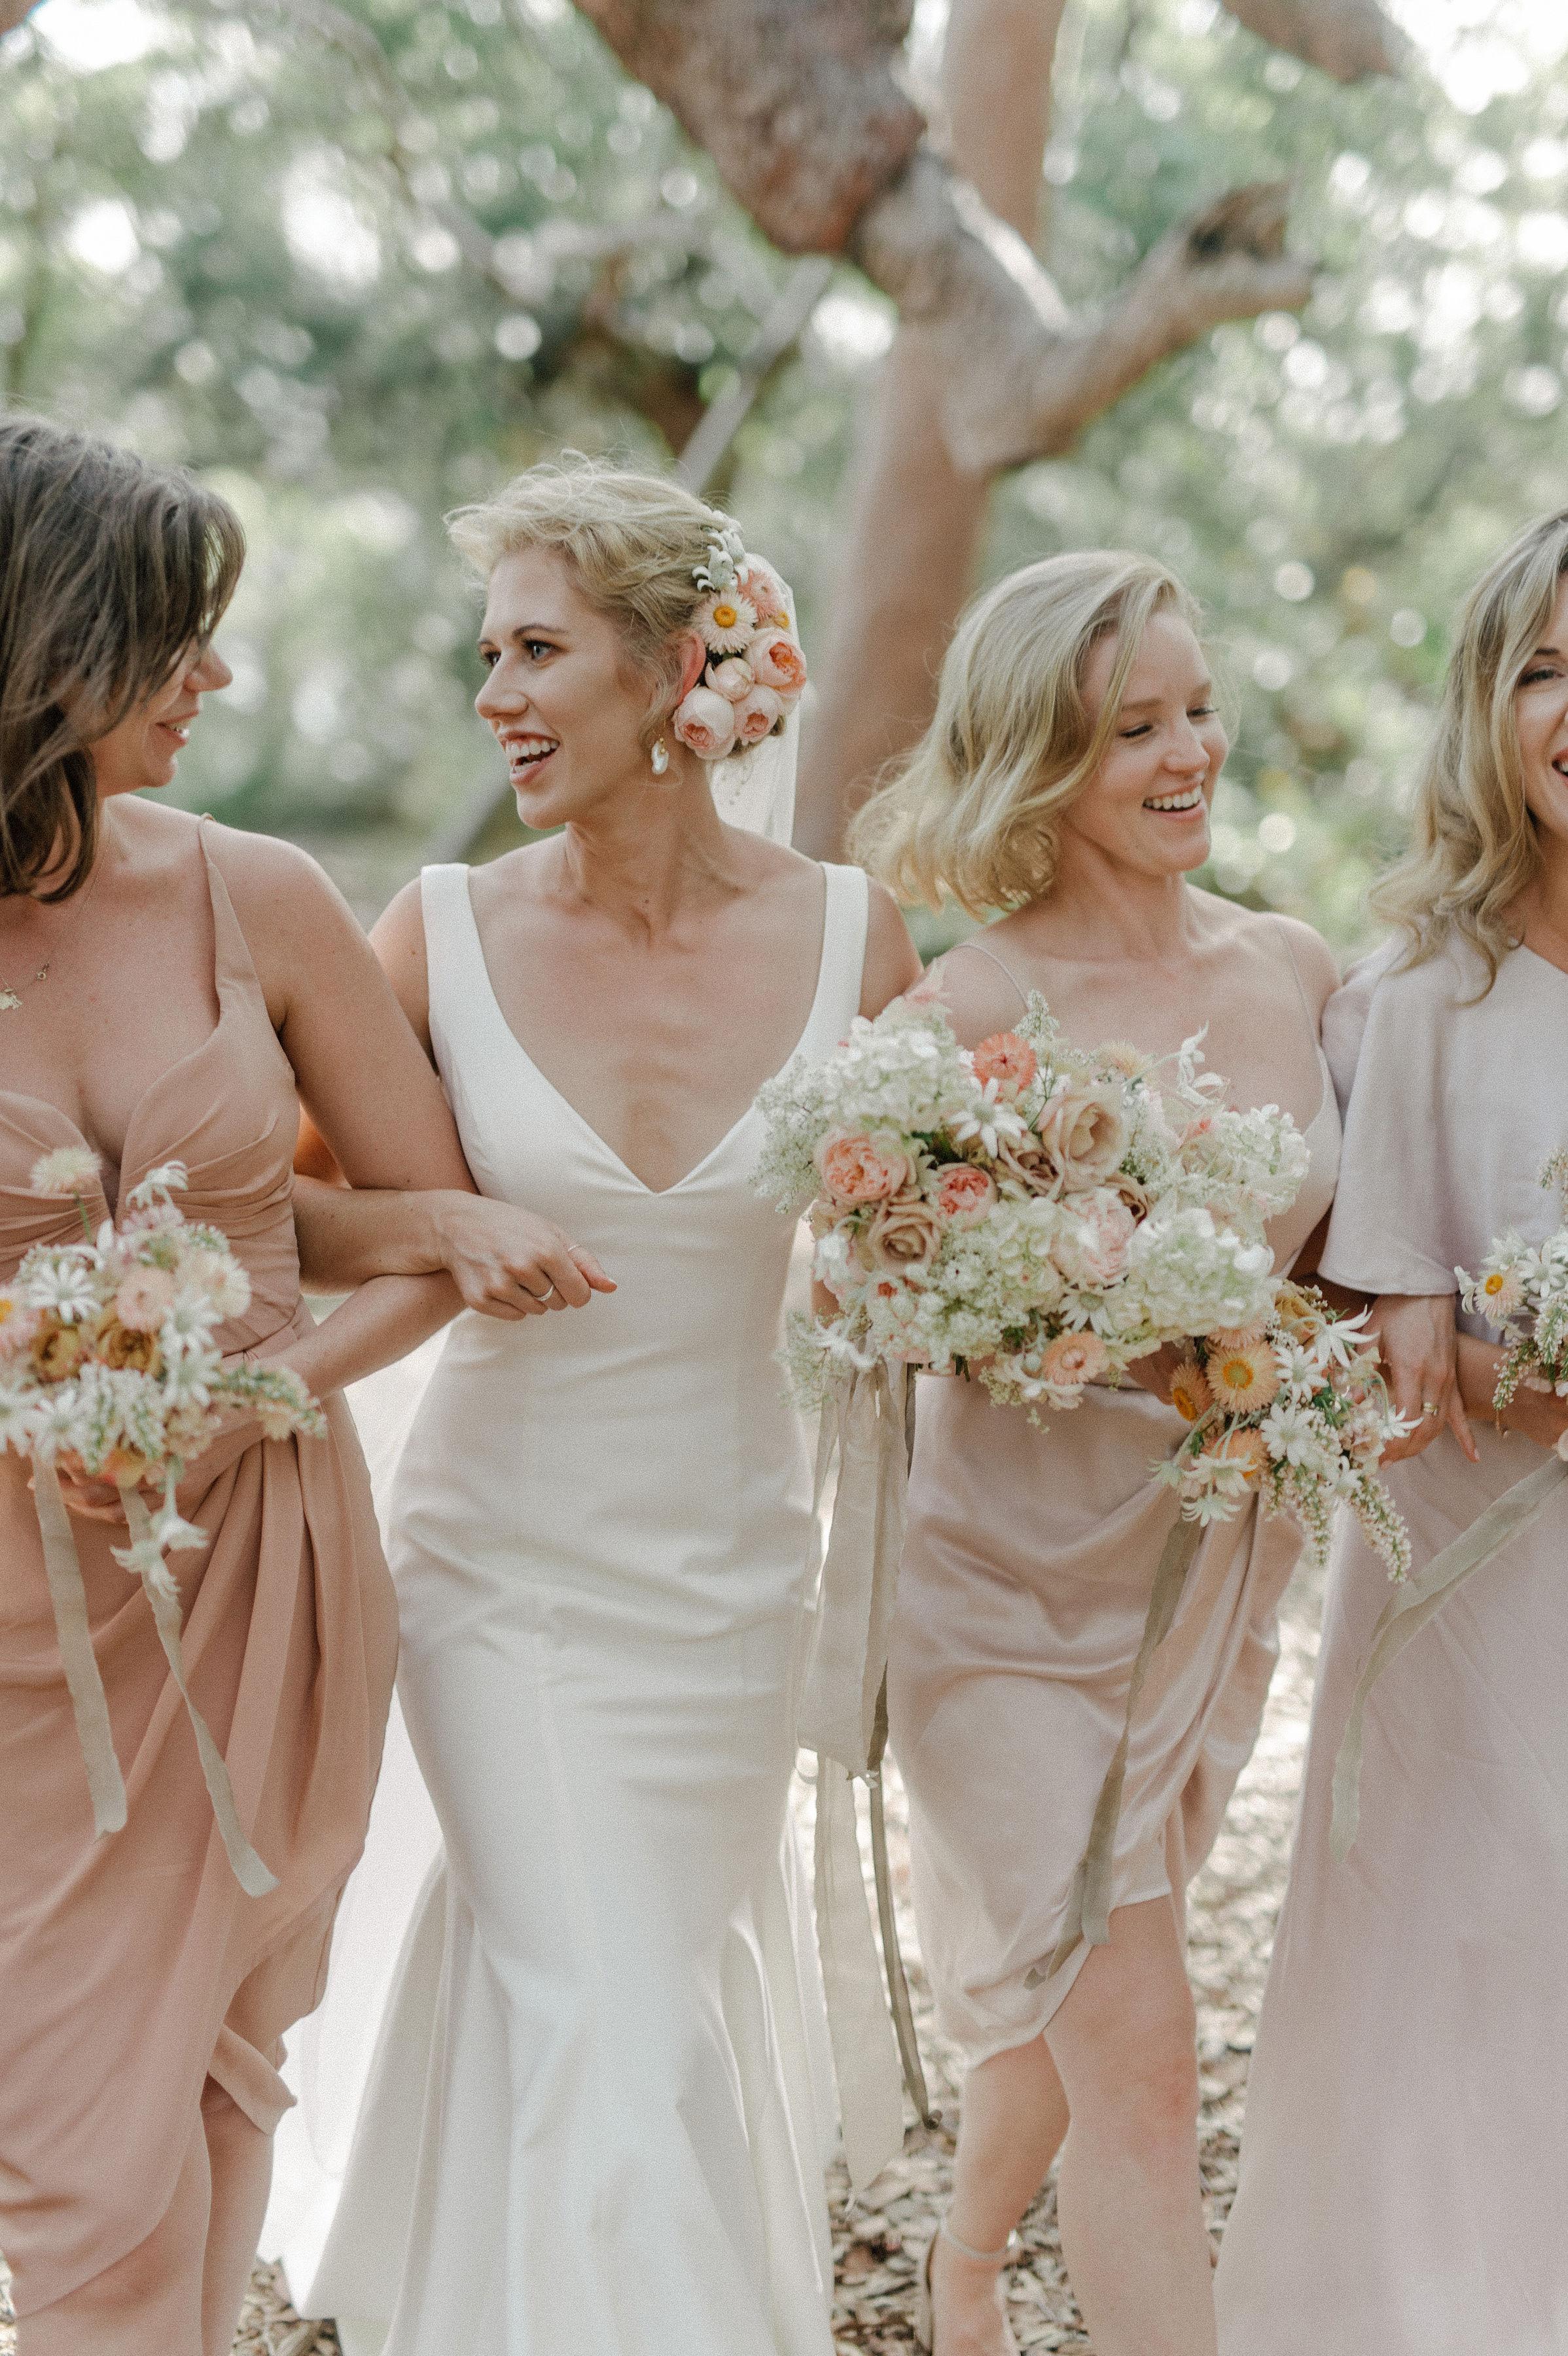 Australian, romantic, beach wedding flowers